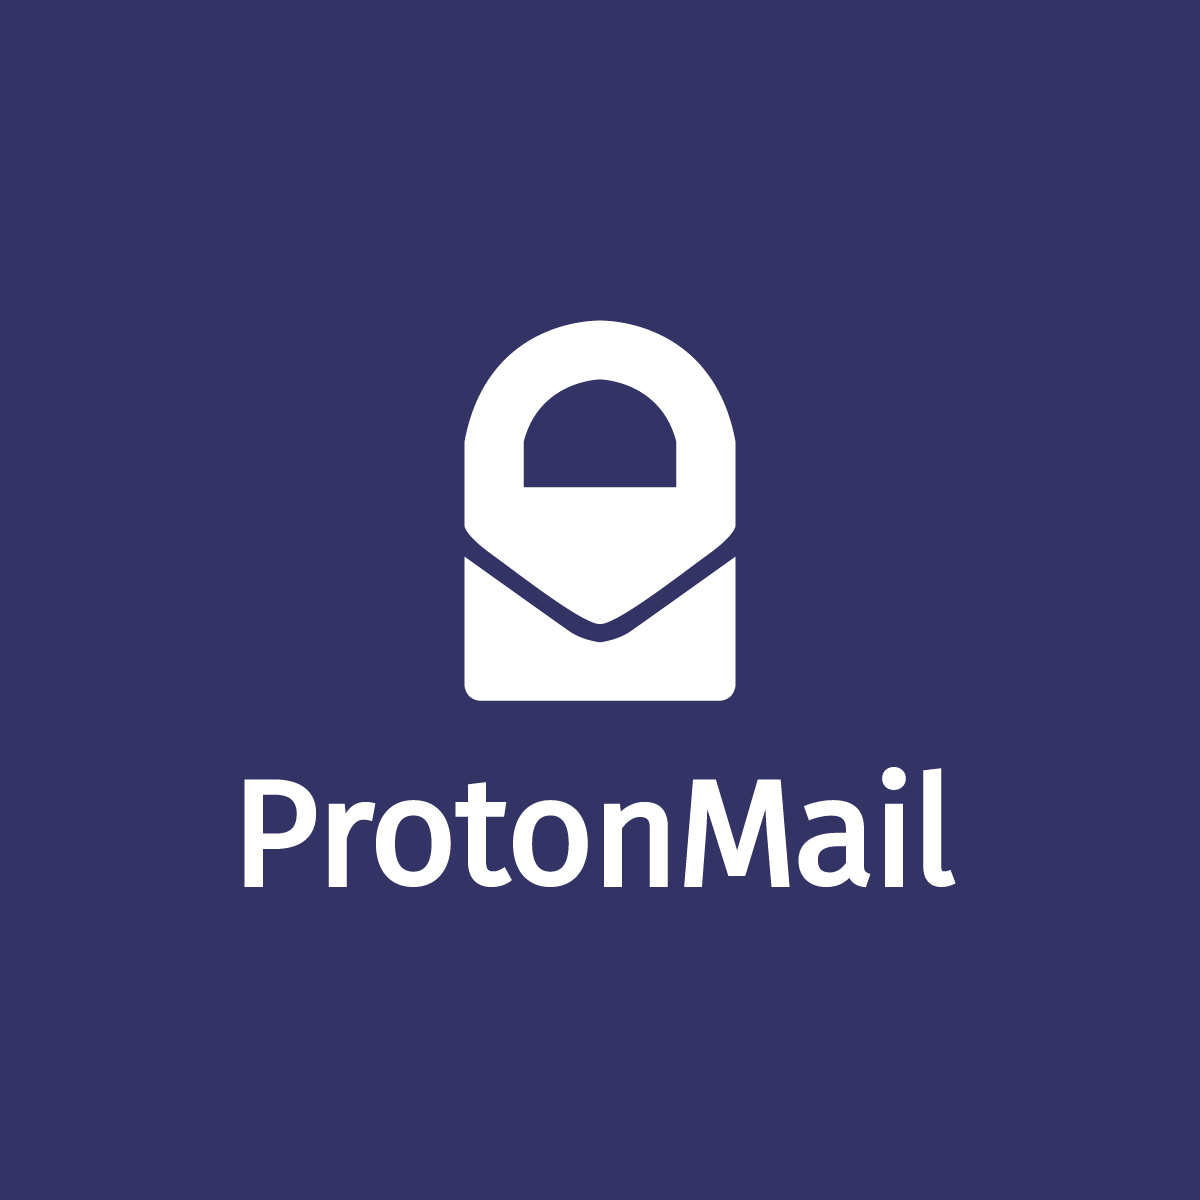 manualen@protonmail.com